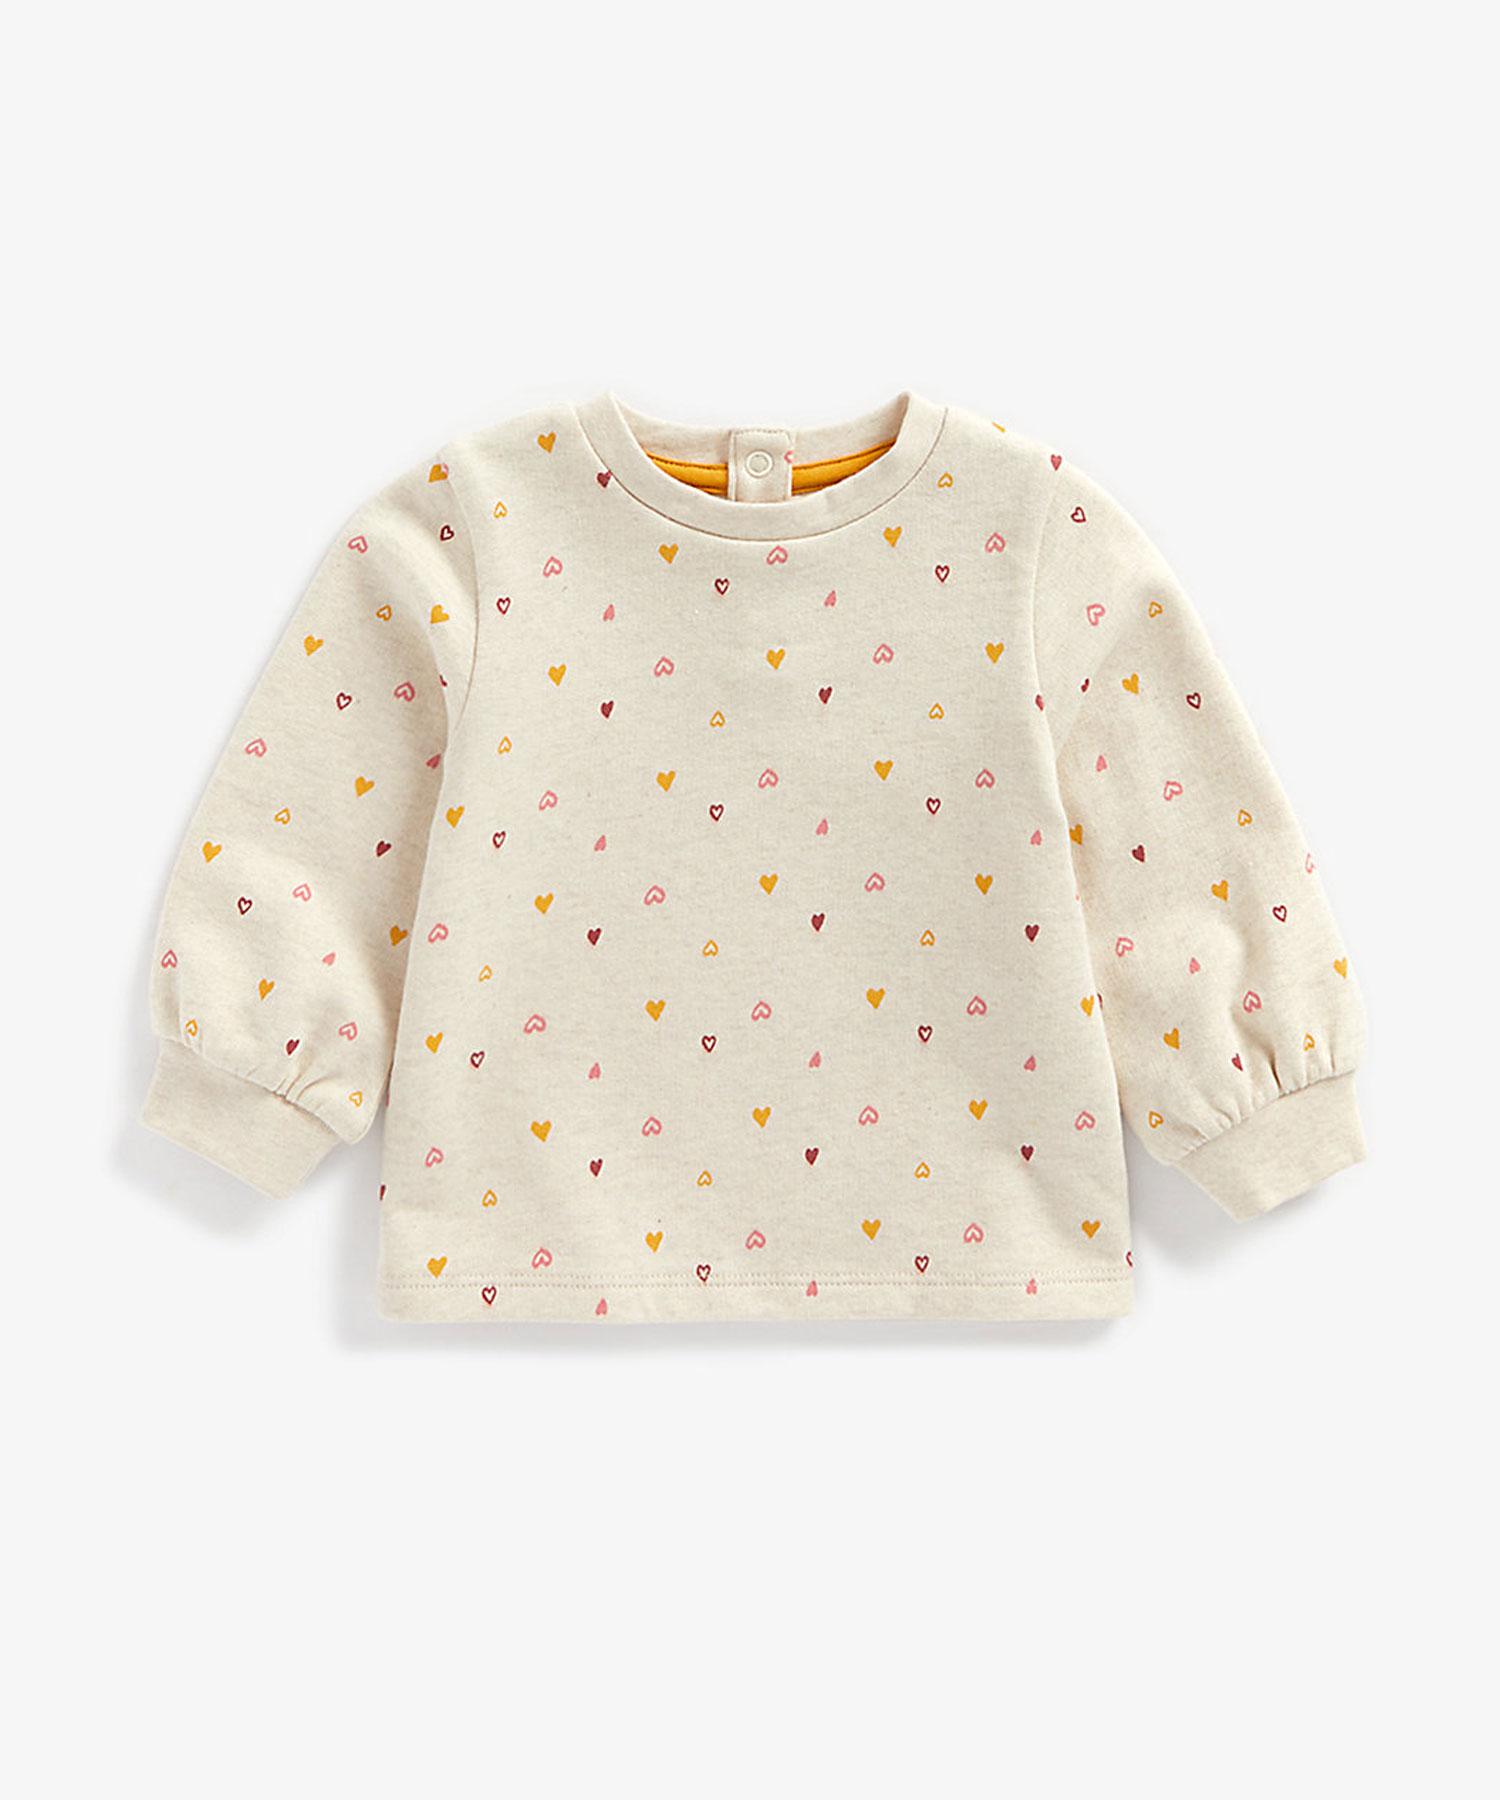 Mothercare | Girls Full Sleeves Sweatshirt Heart Print - Beige